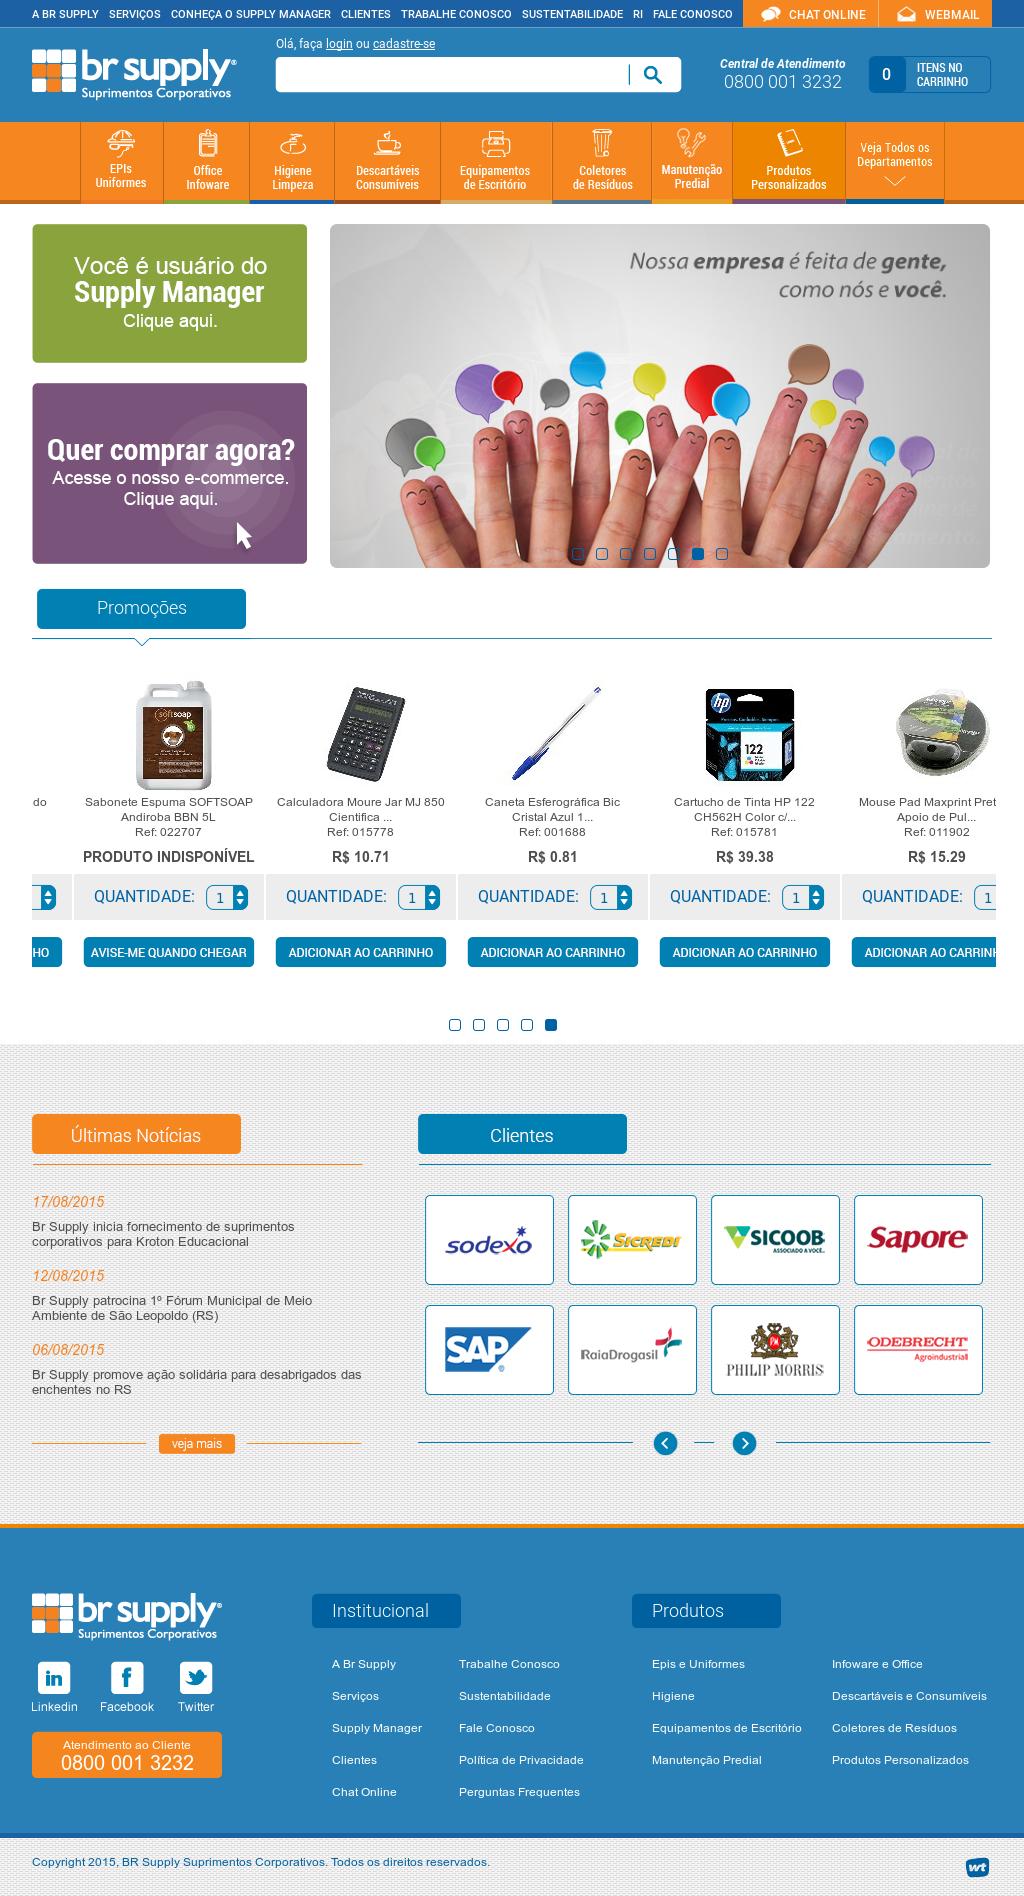 Br Supply Suprimentos Corporativos Competitors, Revenue and Employees -  Owler Company Profile 45a20a12d3